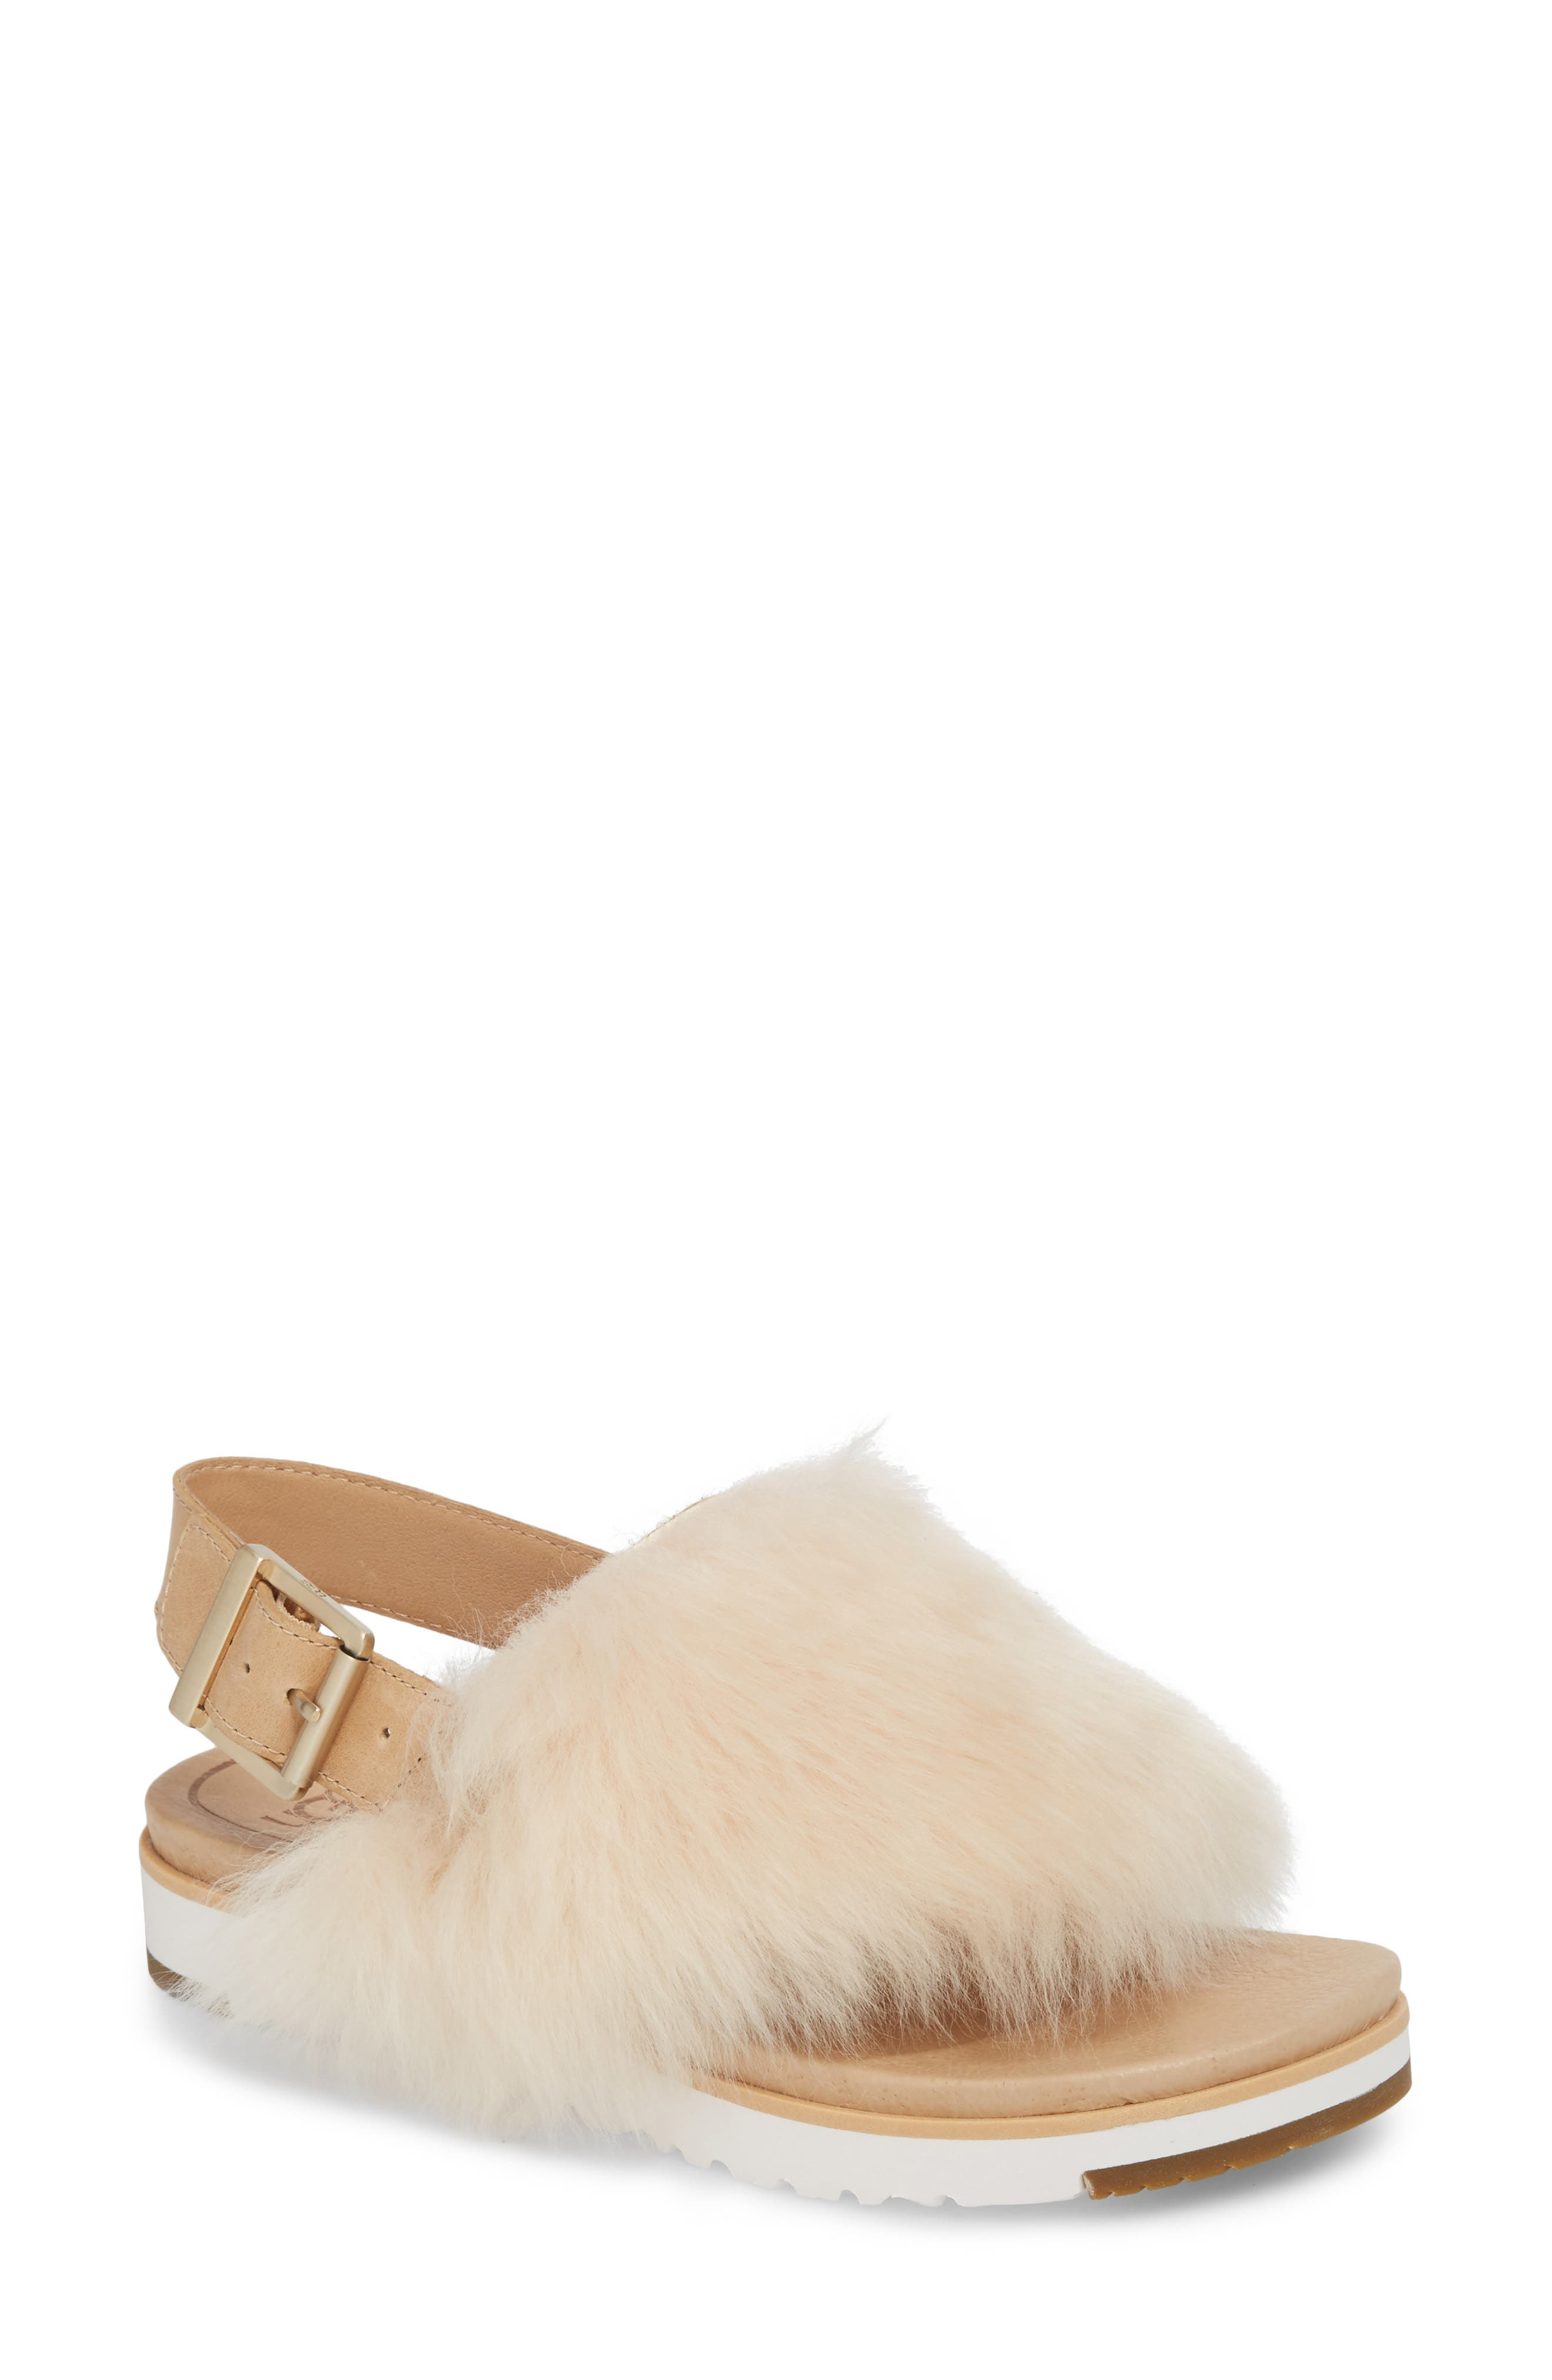 Ugg Holly Genuine Shearling Sandal, Beige